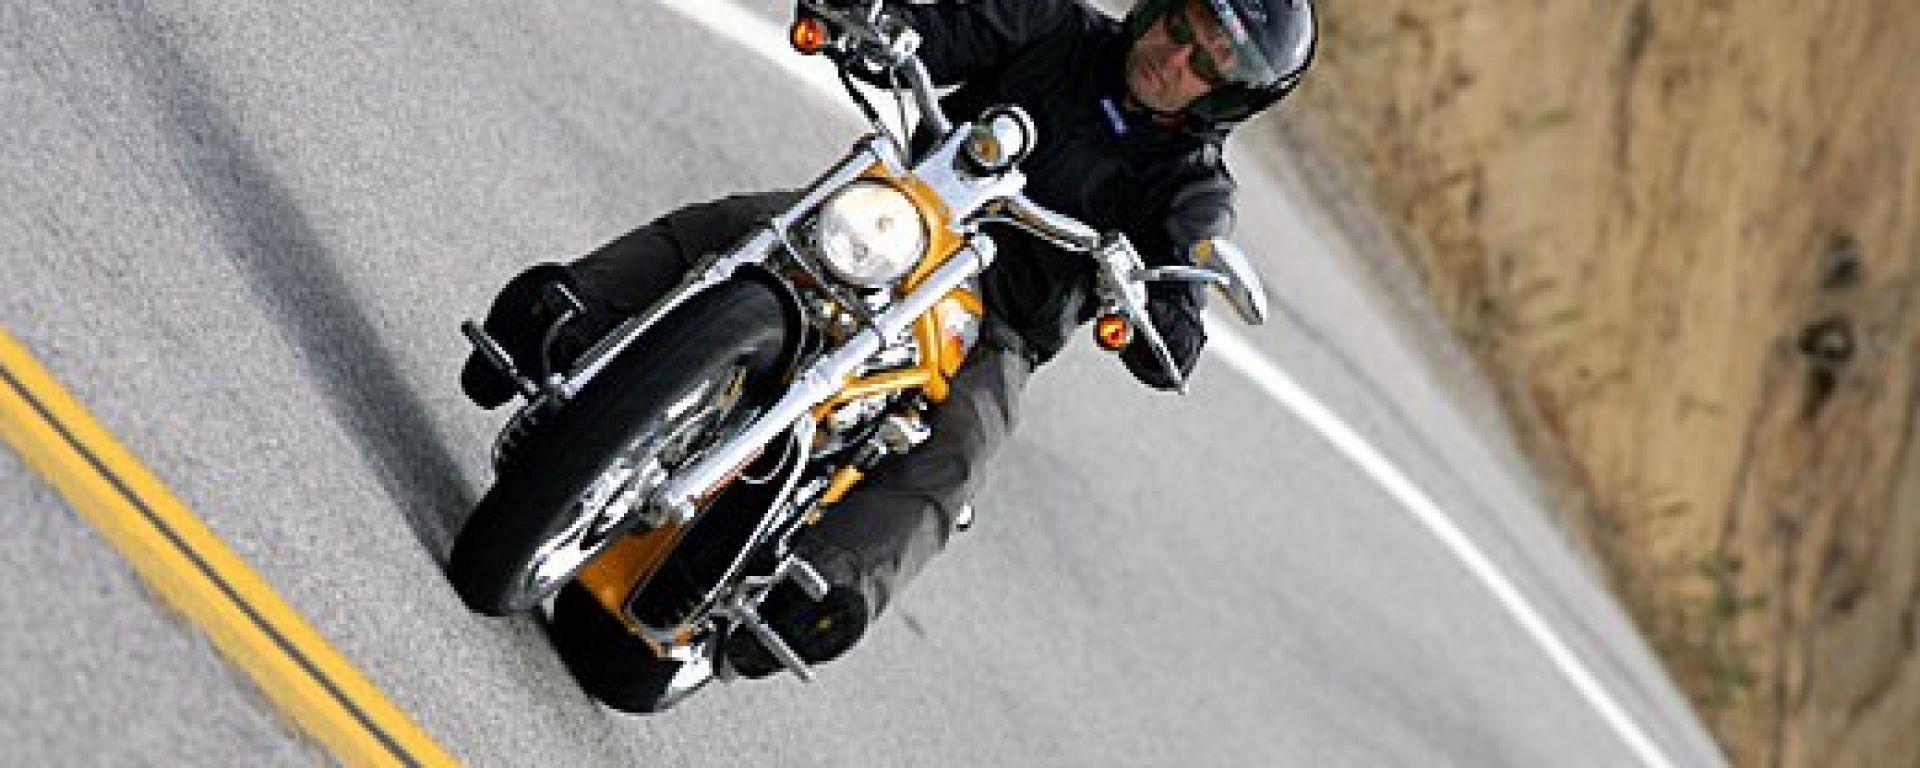 Harley Davidson CVO 2006